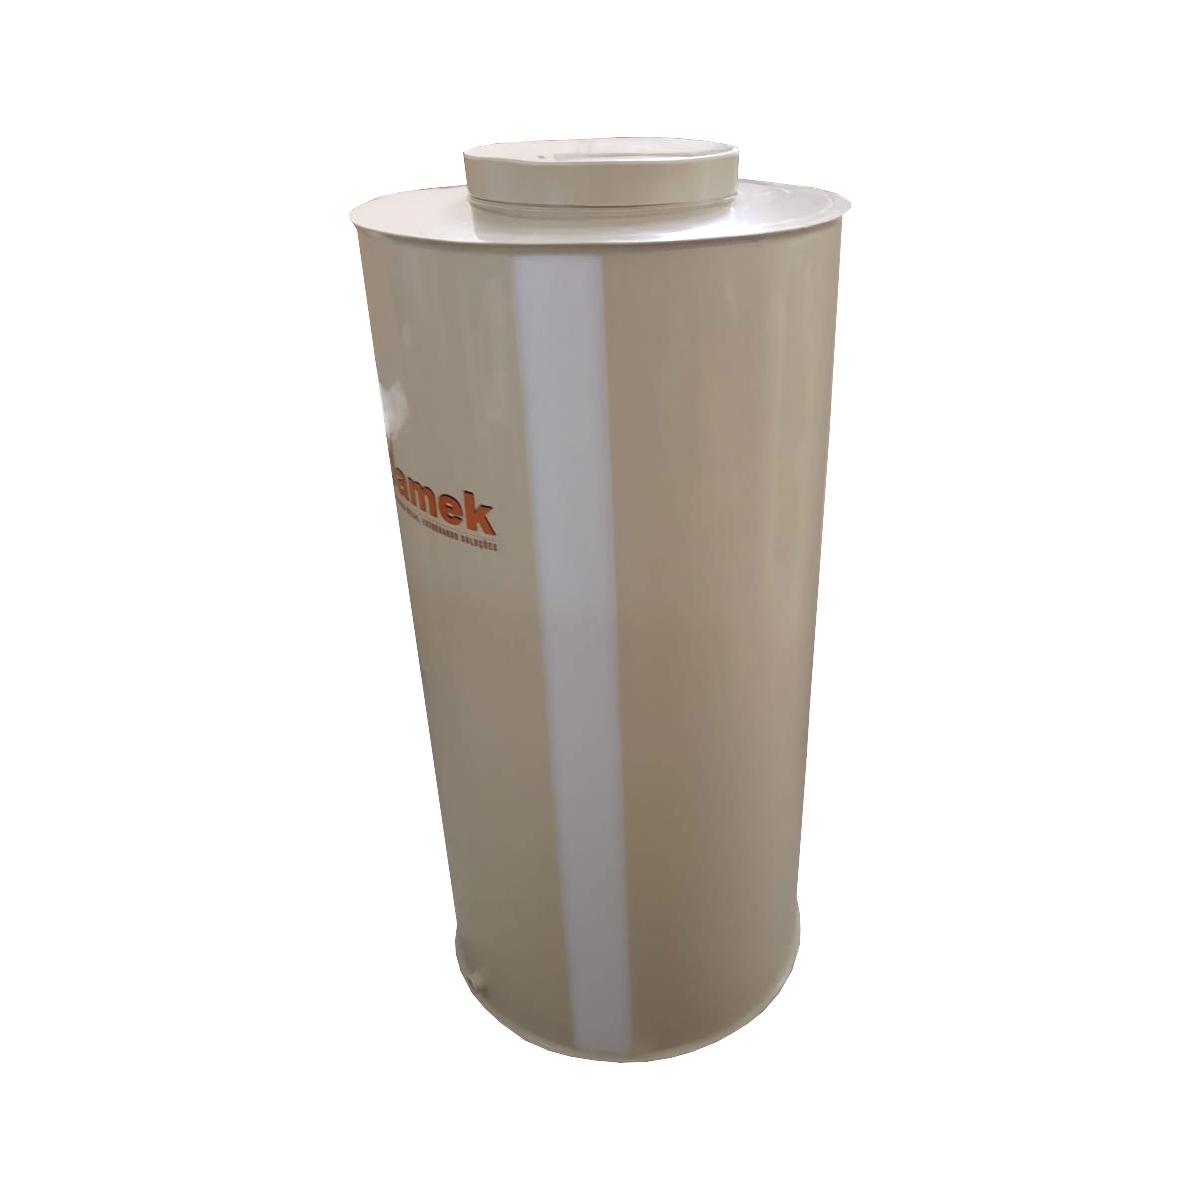 - Reservatório Plástico 120 L / Atóxico / Sem Visor Nível